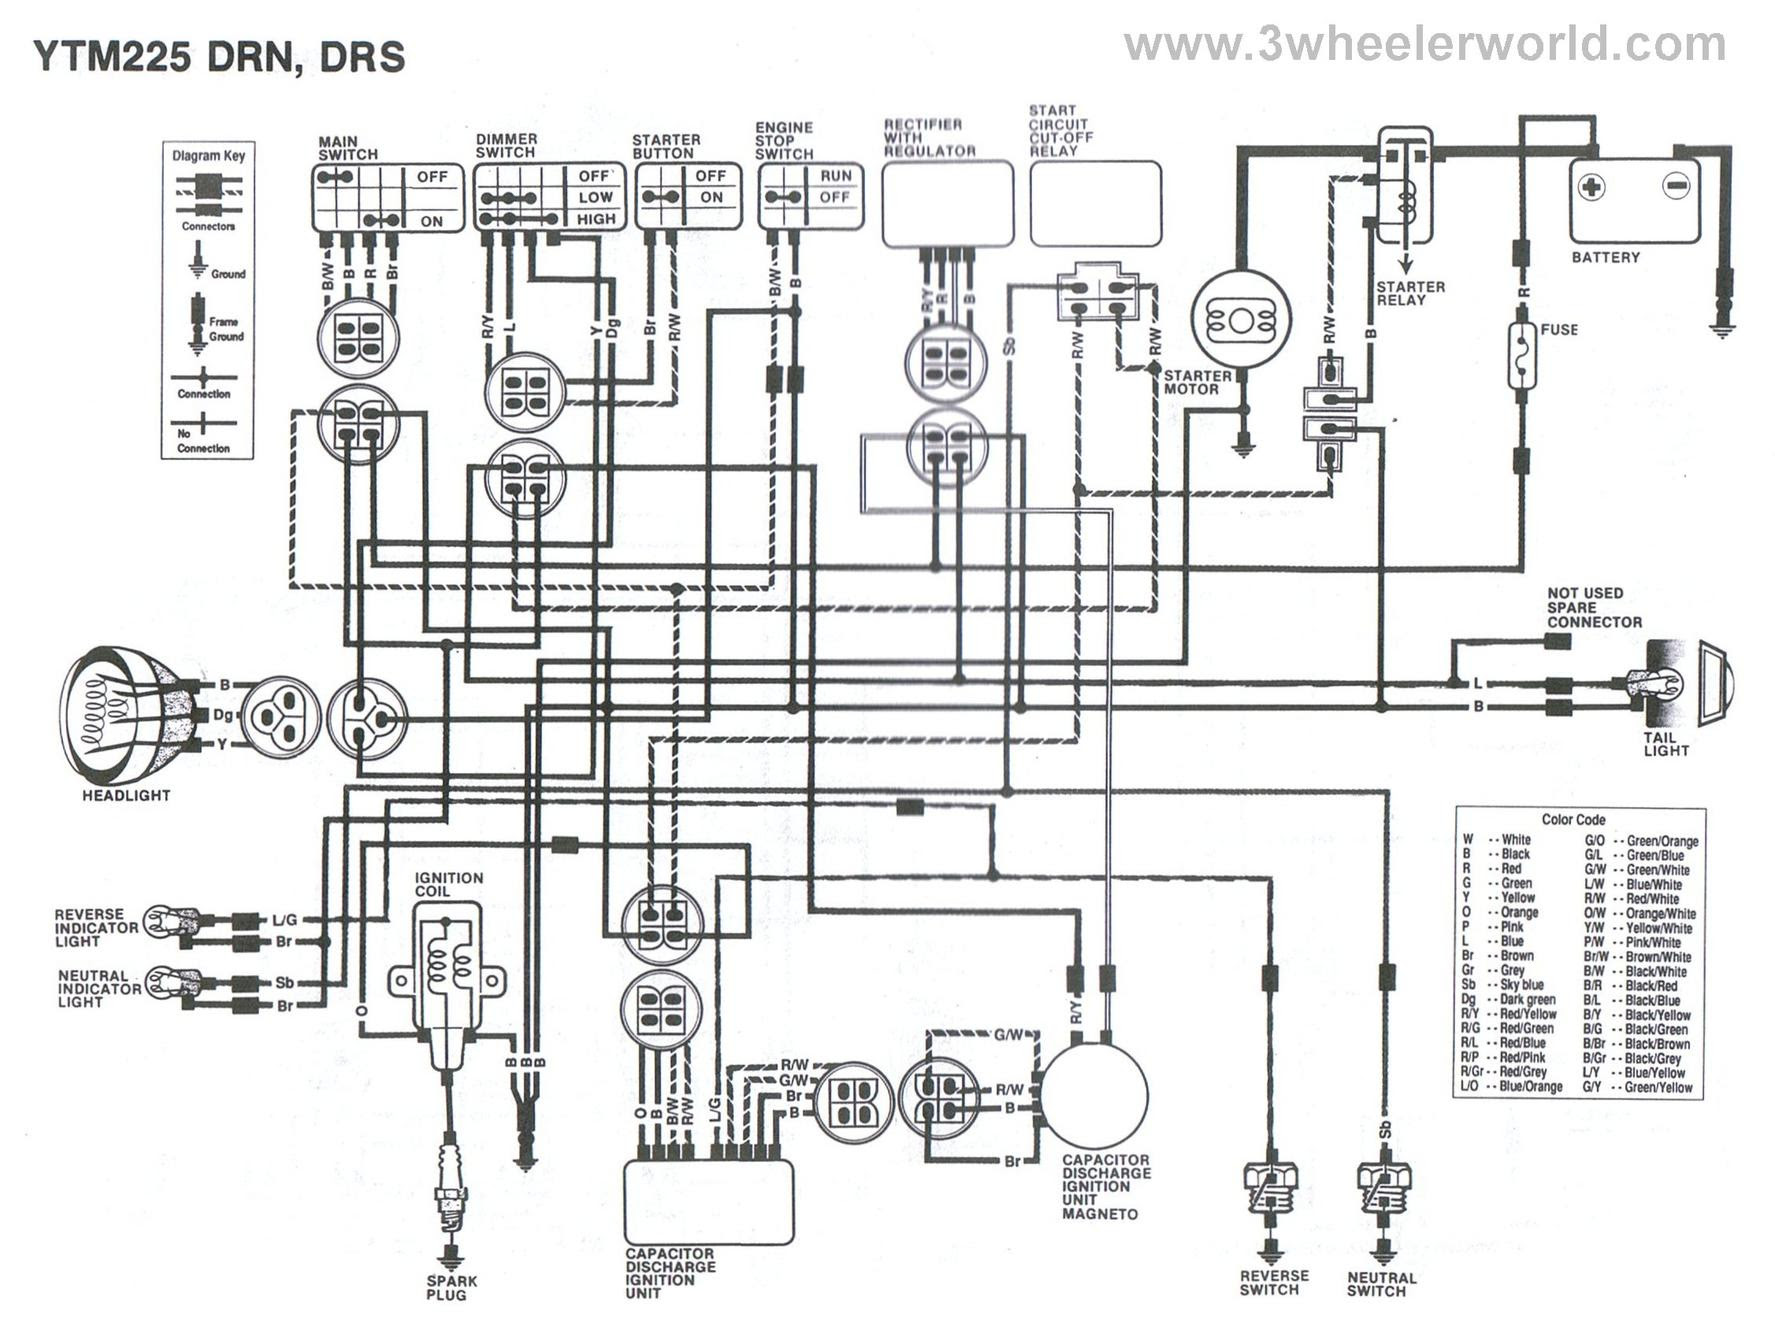 1972 Yamaha 400 2 Stroke Wiring Diagram Wiring Diagram Modernize Modernize Frankmotors Es